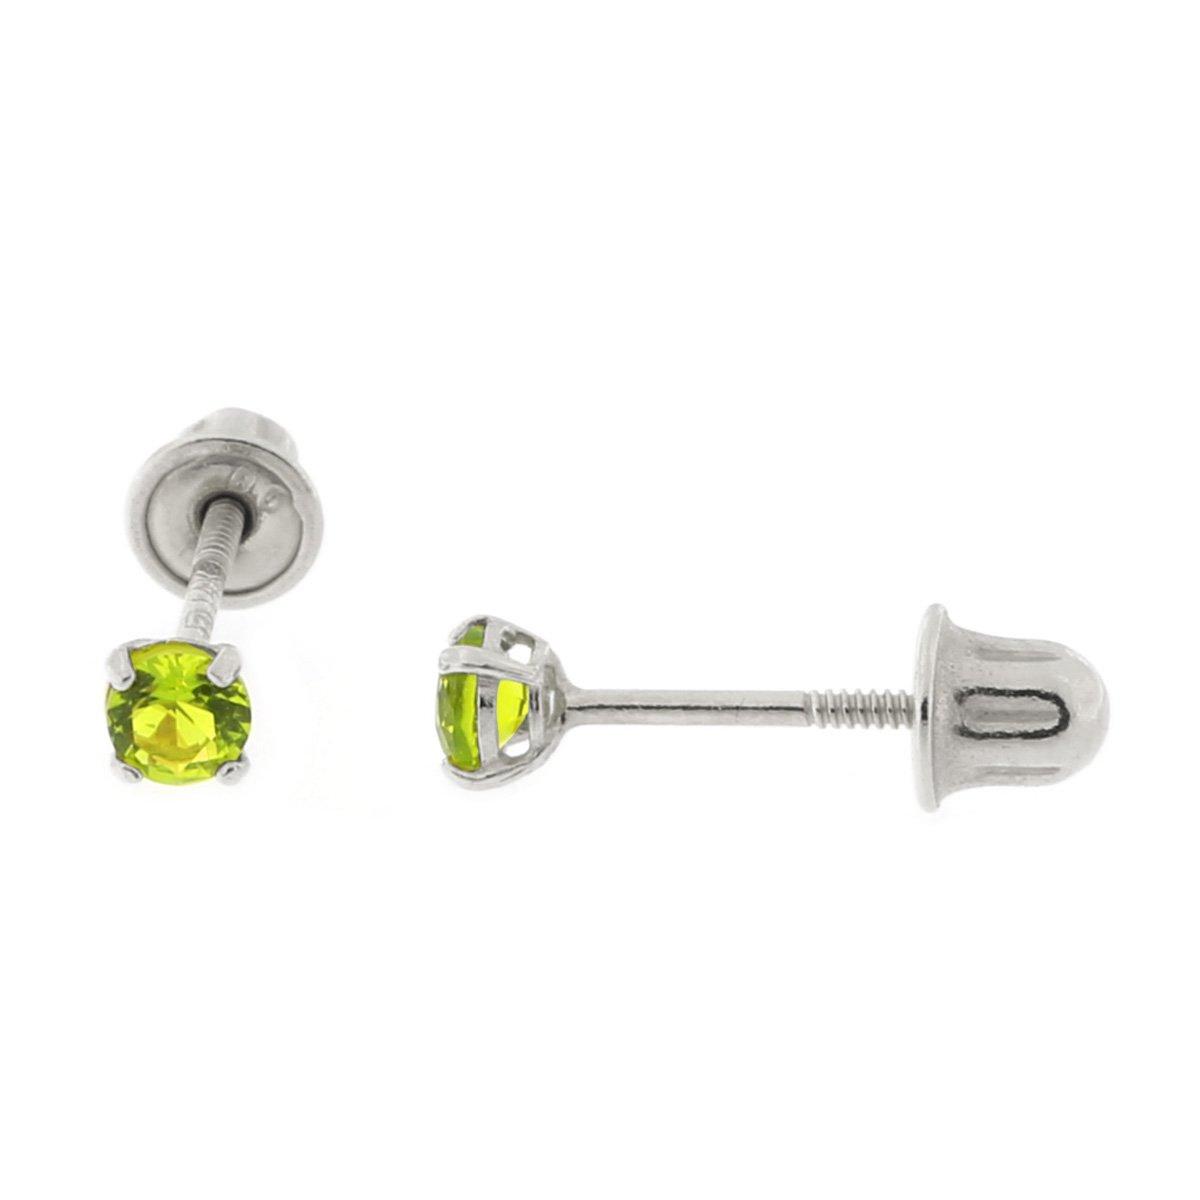 14k Yellow or White Gold Round Simulated Peridot Screwback Earrings